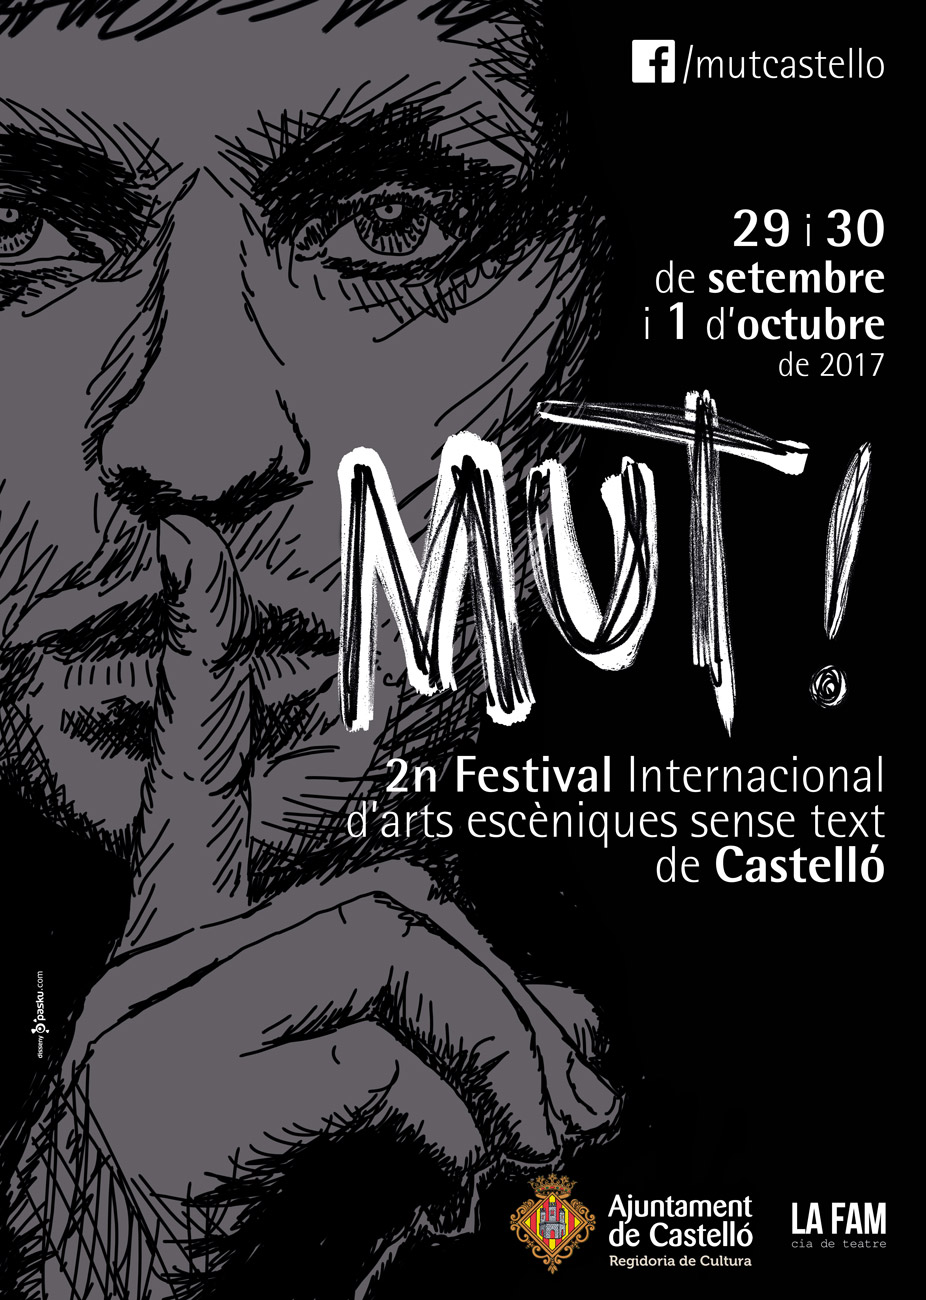 MUT! 2n Festival Internacional d'arts escèniques sense text de Castelló